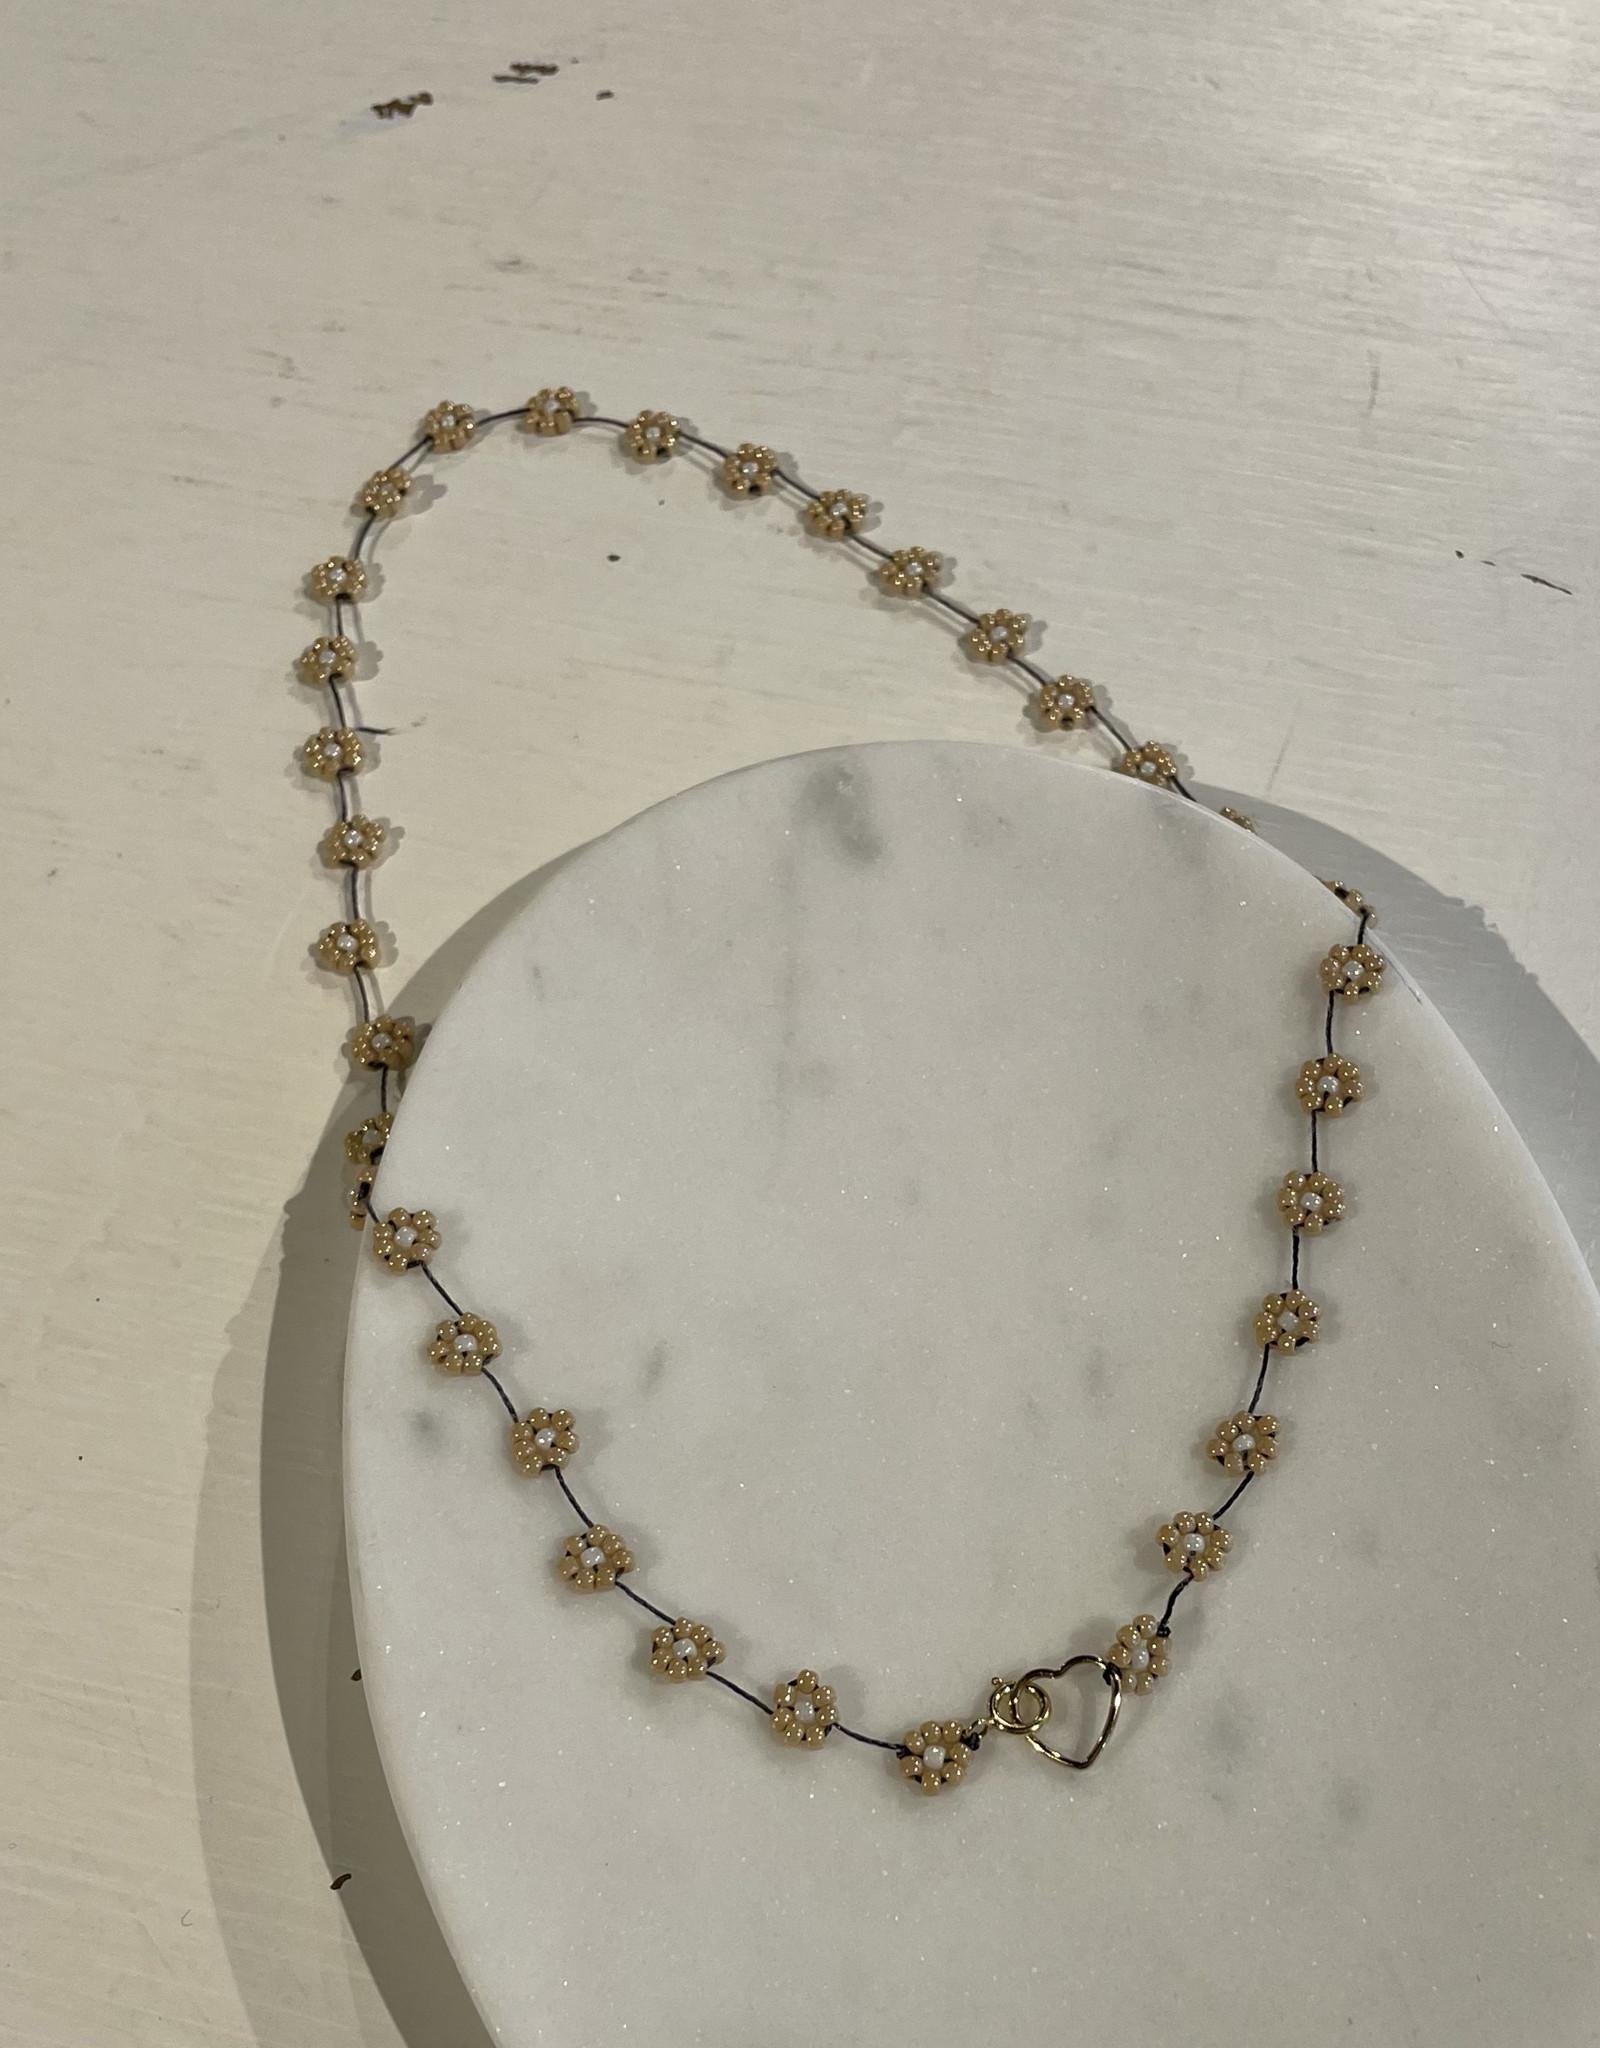 Atelier Labro Fiori Necklace Dark Beige